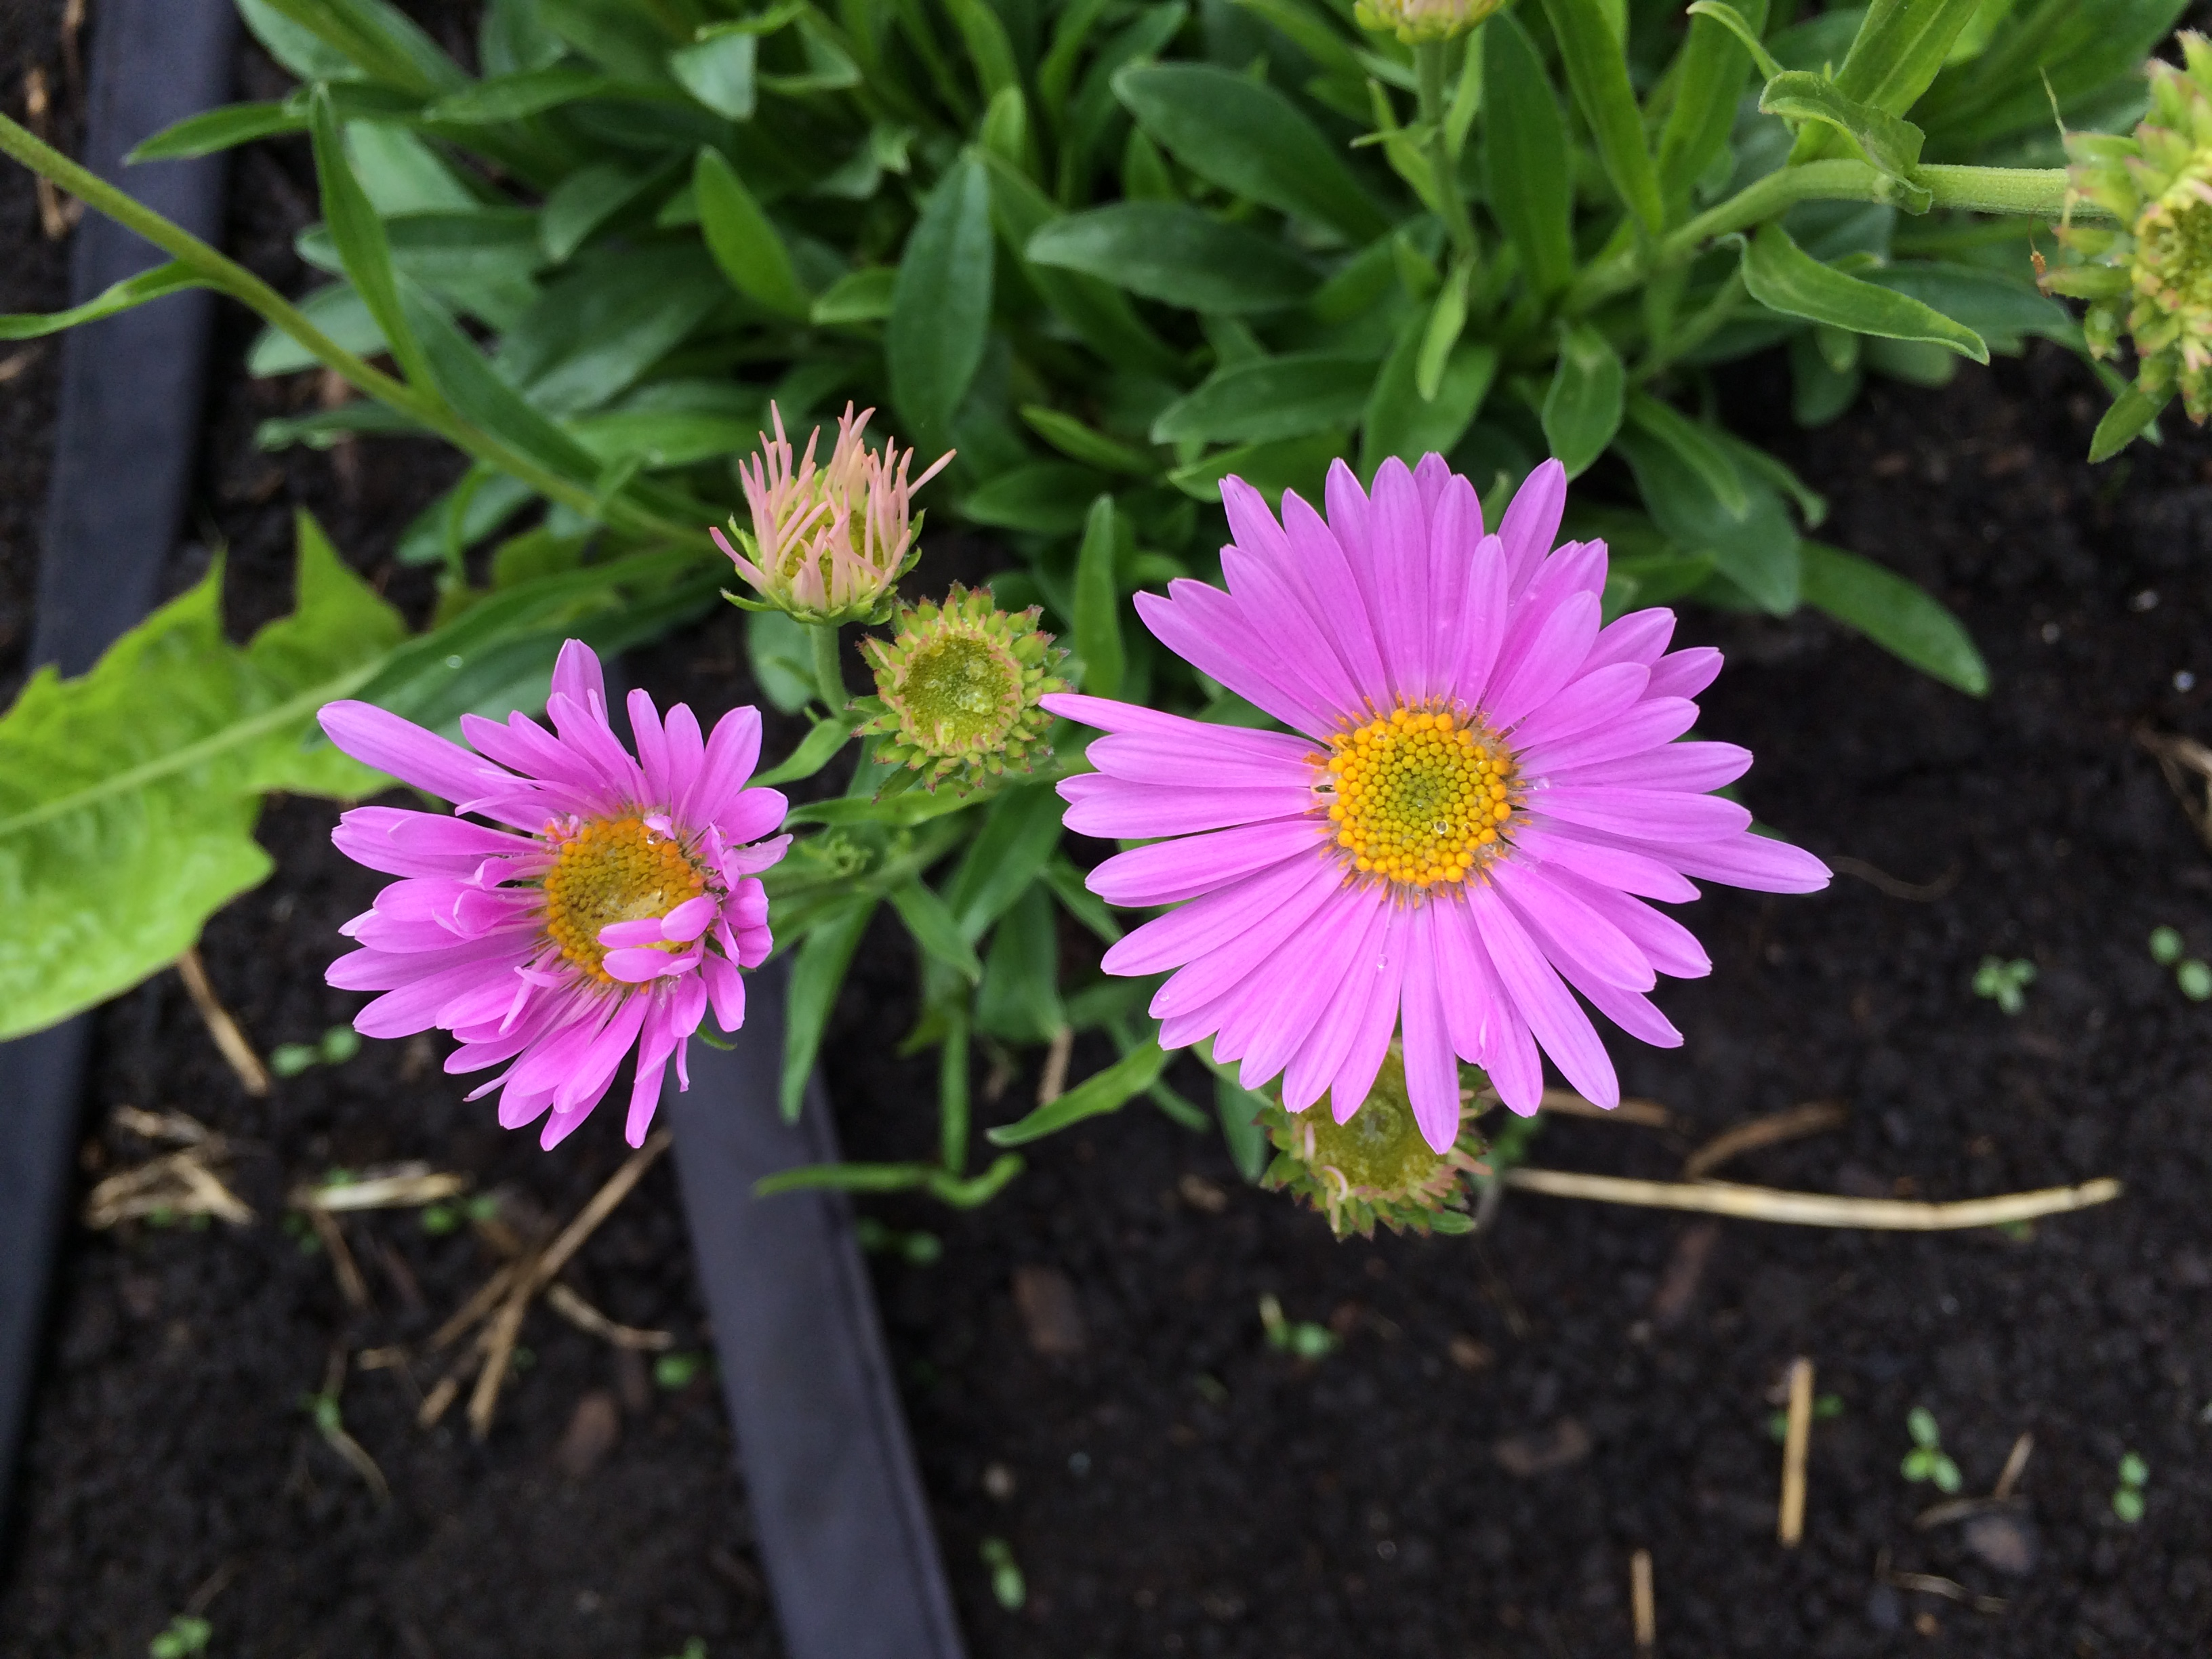 Garden Update: It's Summer, Baby